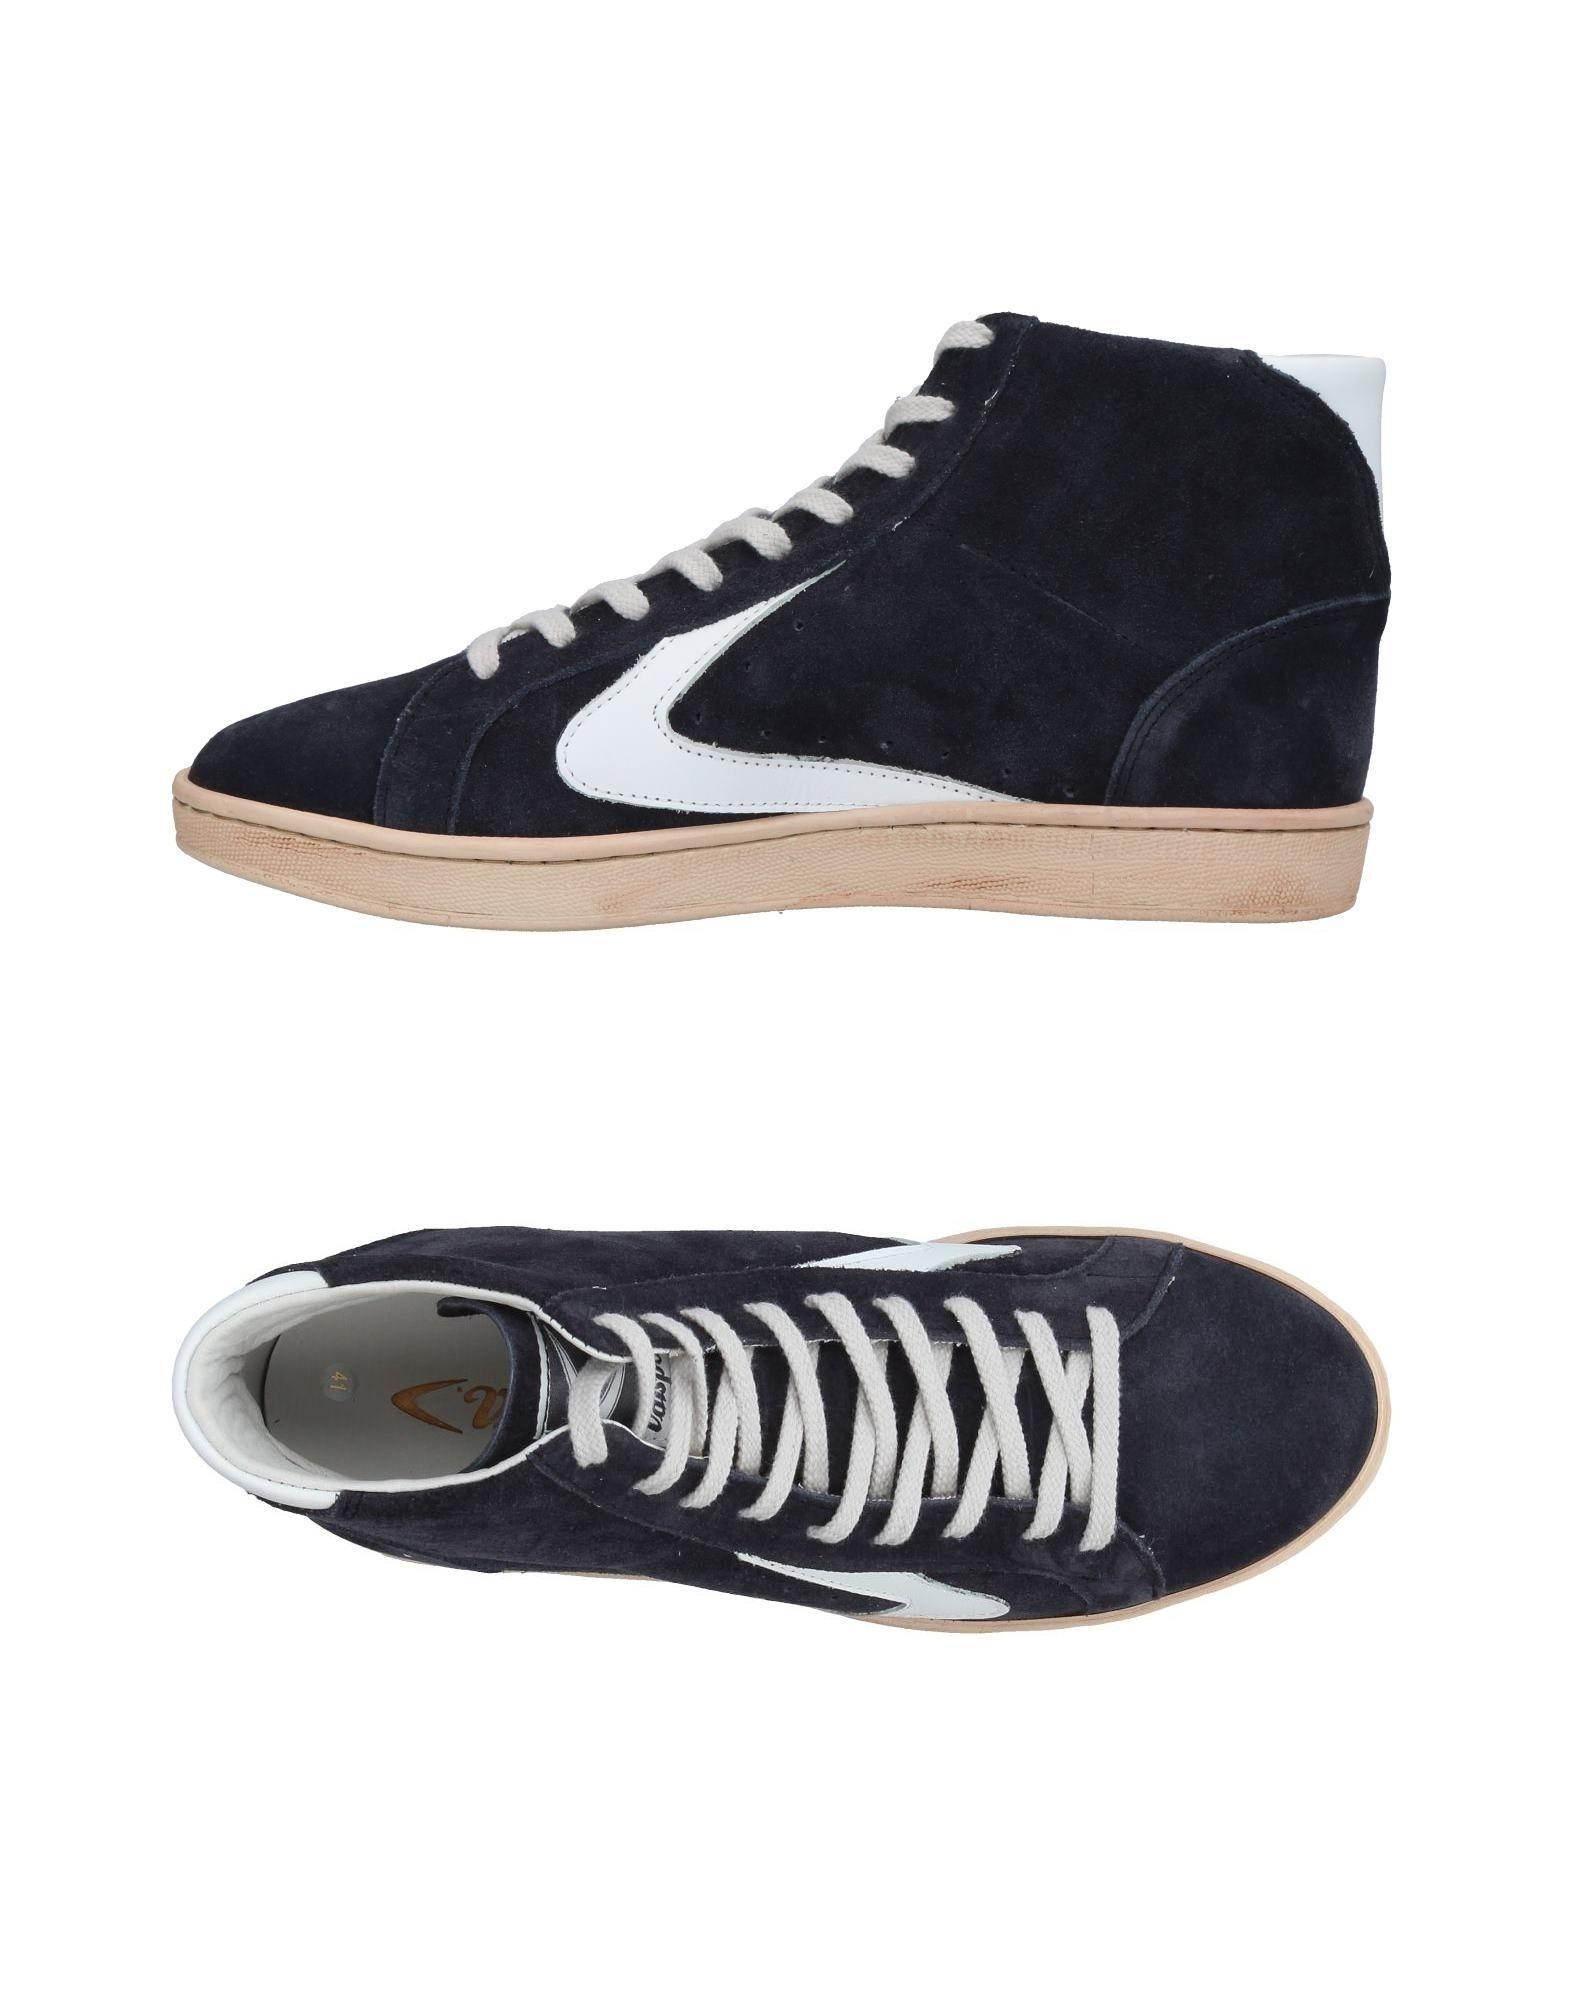 FOOTWEAR - High-tops & sneakers Valsport oS127